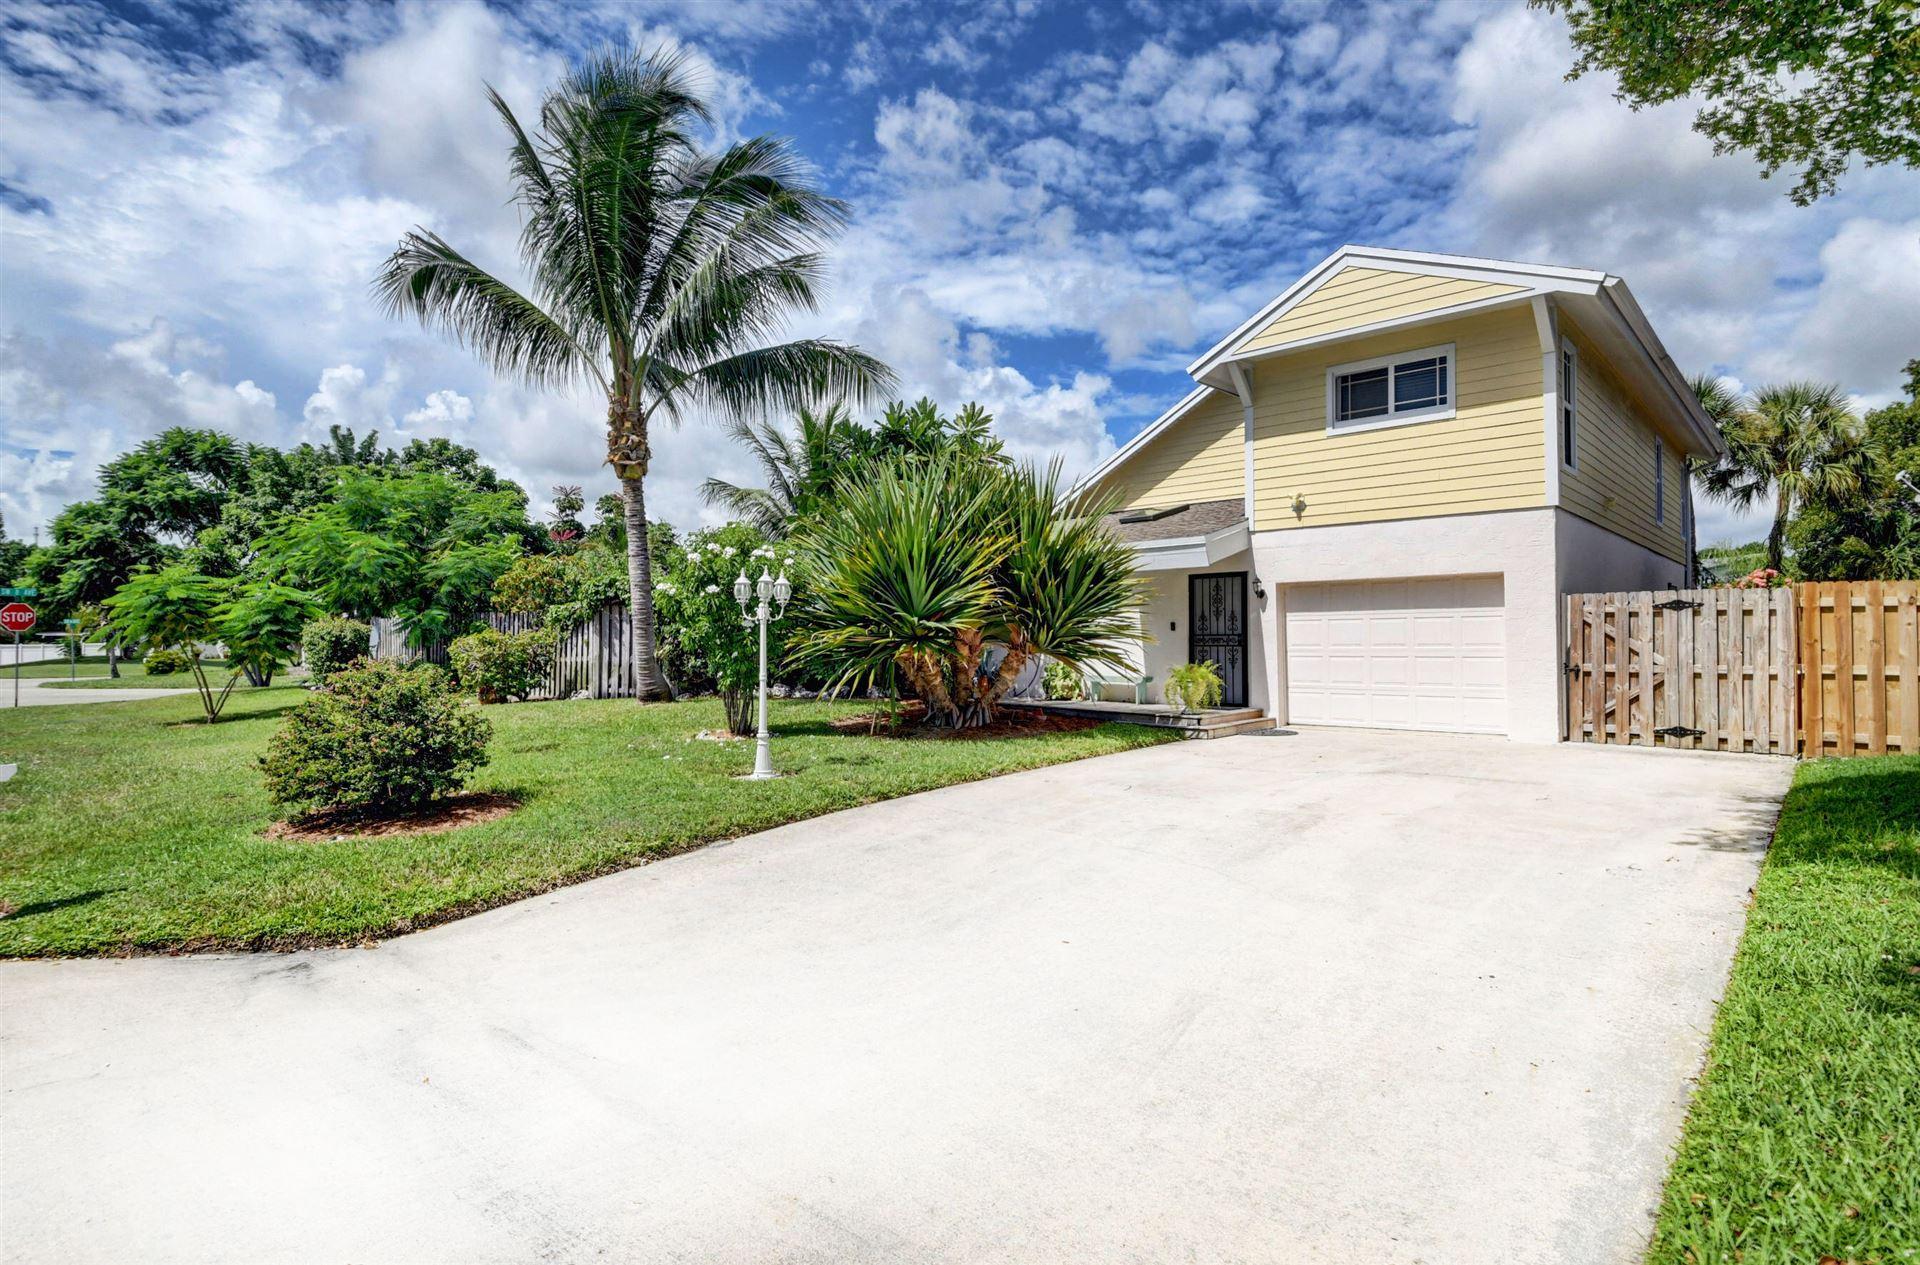 2475 Sundy Avenue, Delray Beach, FL 33444 - MLS#: RX-10746295